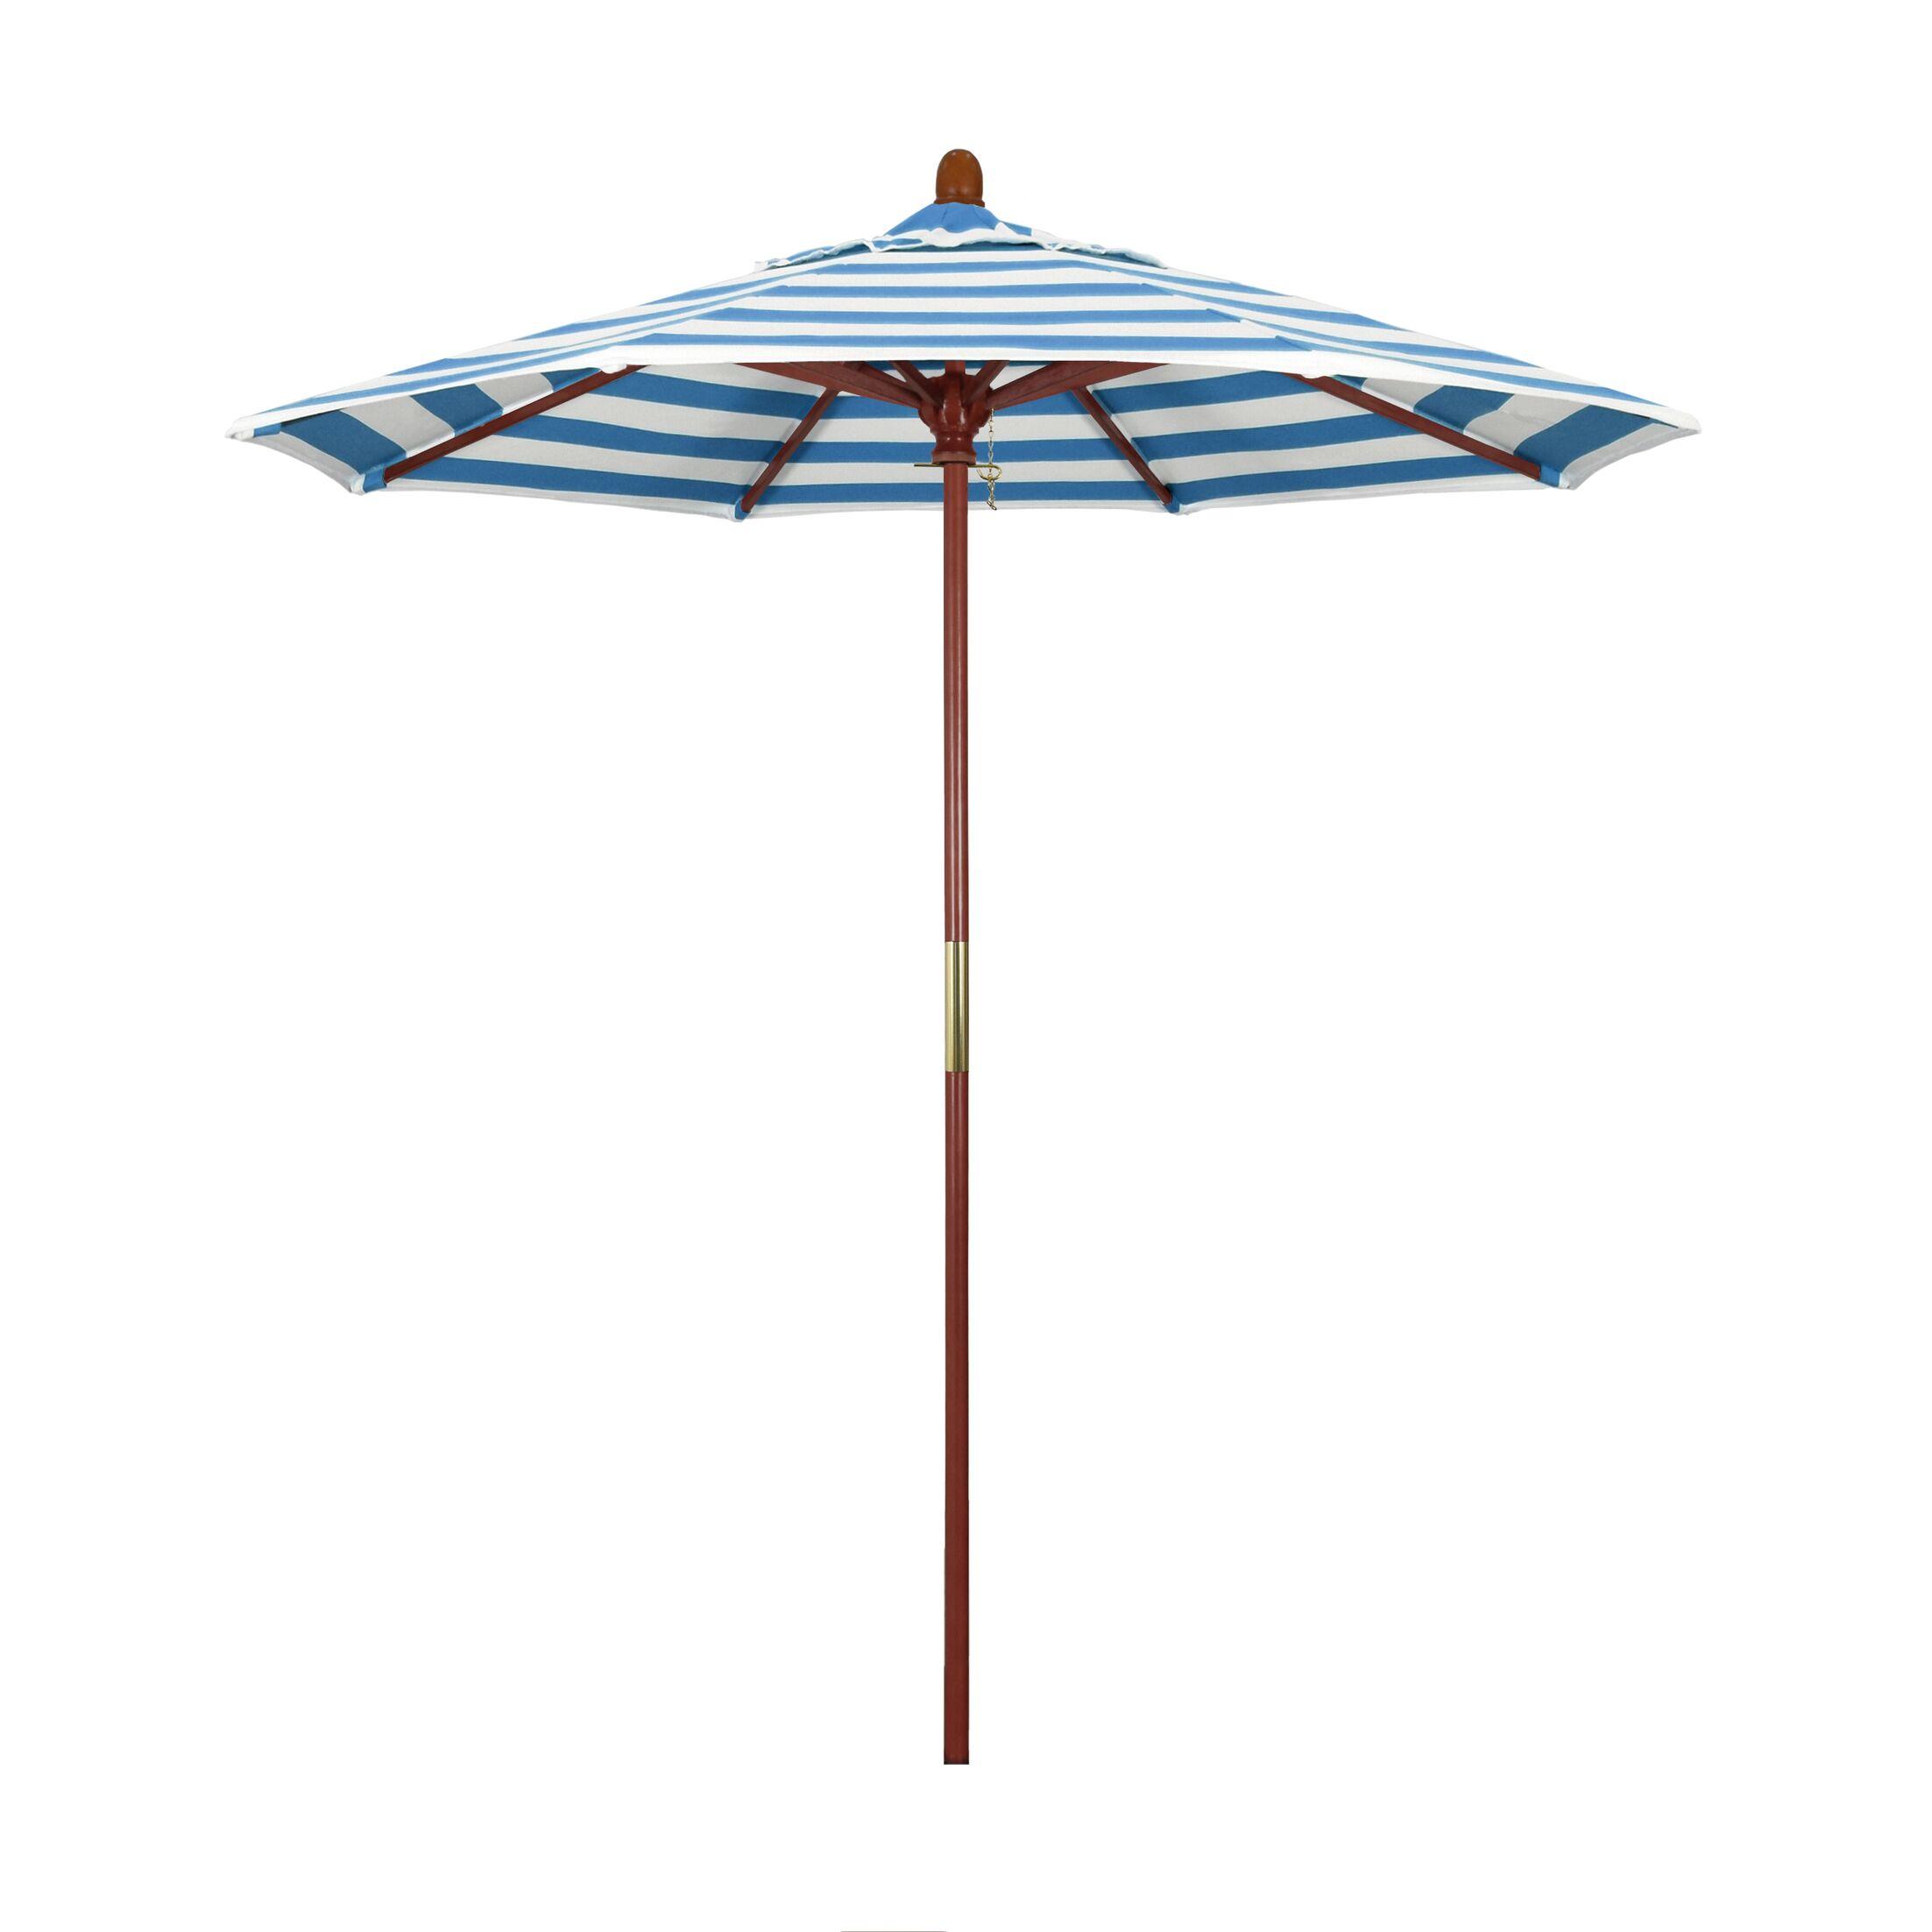 Mare Series 7.5' Market Umbrella Fabric: Regatta